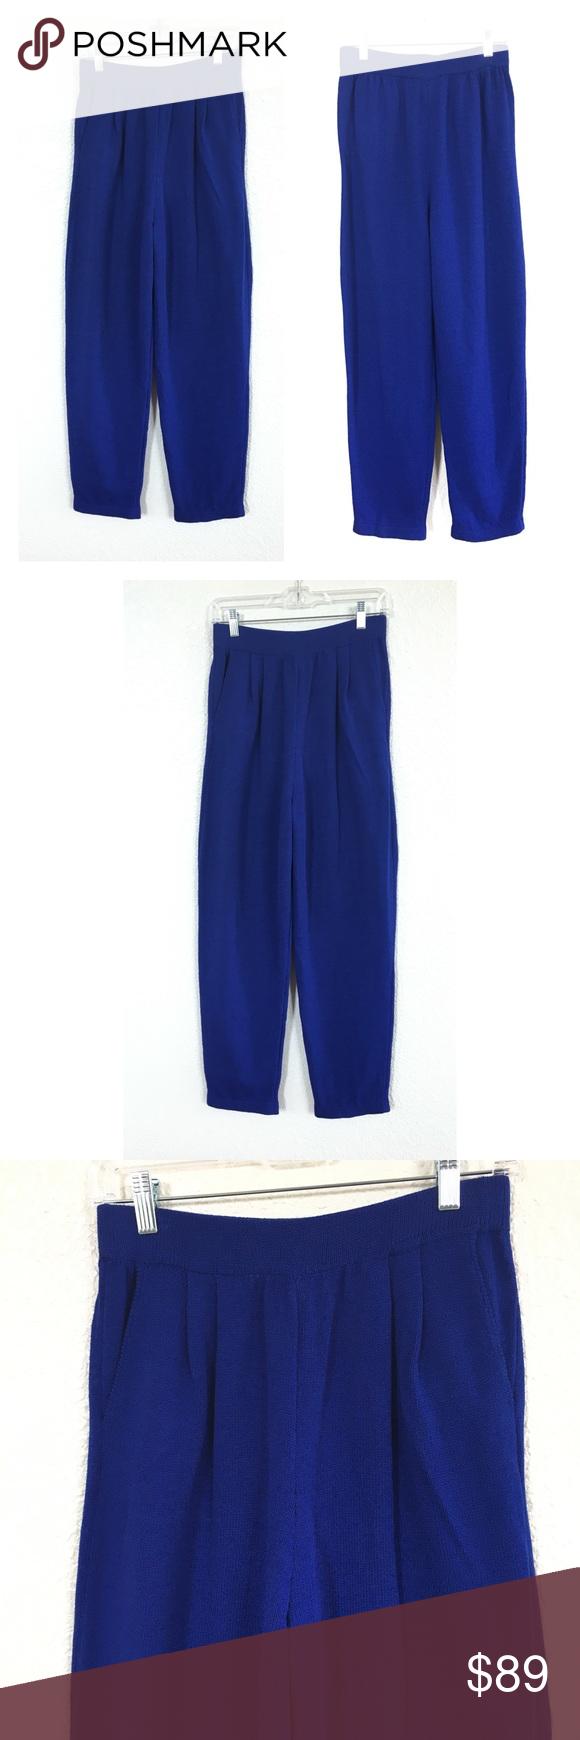 a21fa8a15f8 St. John By Marie Gray Royal Blue Santana Knit St. John Womens Size ...